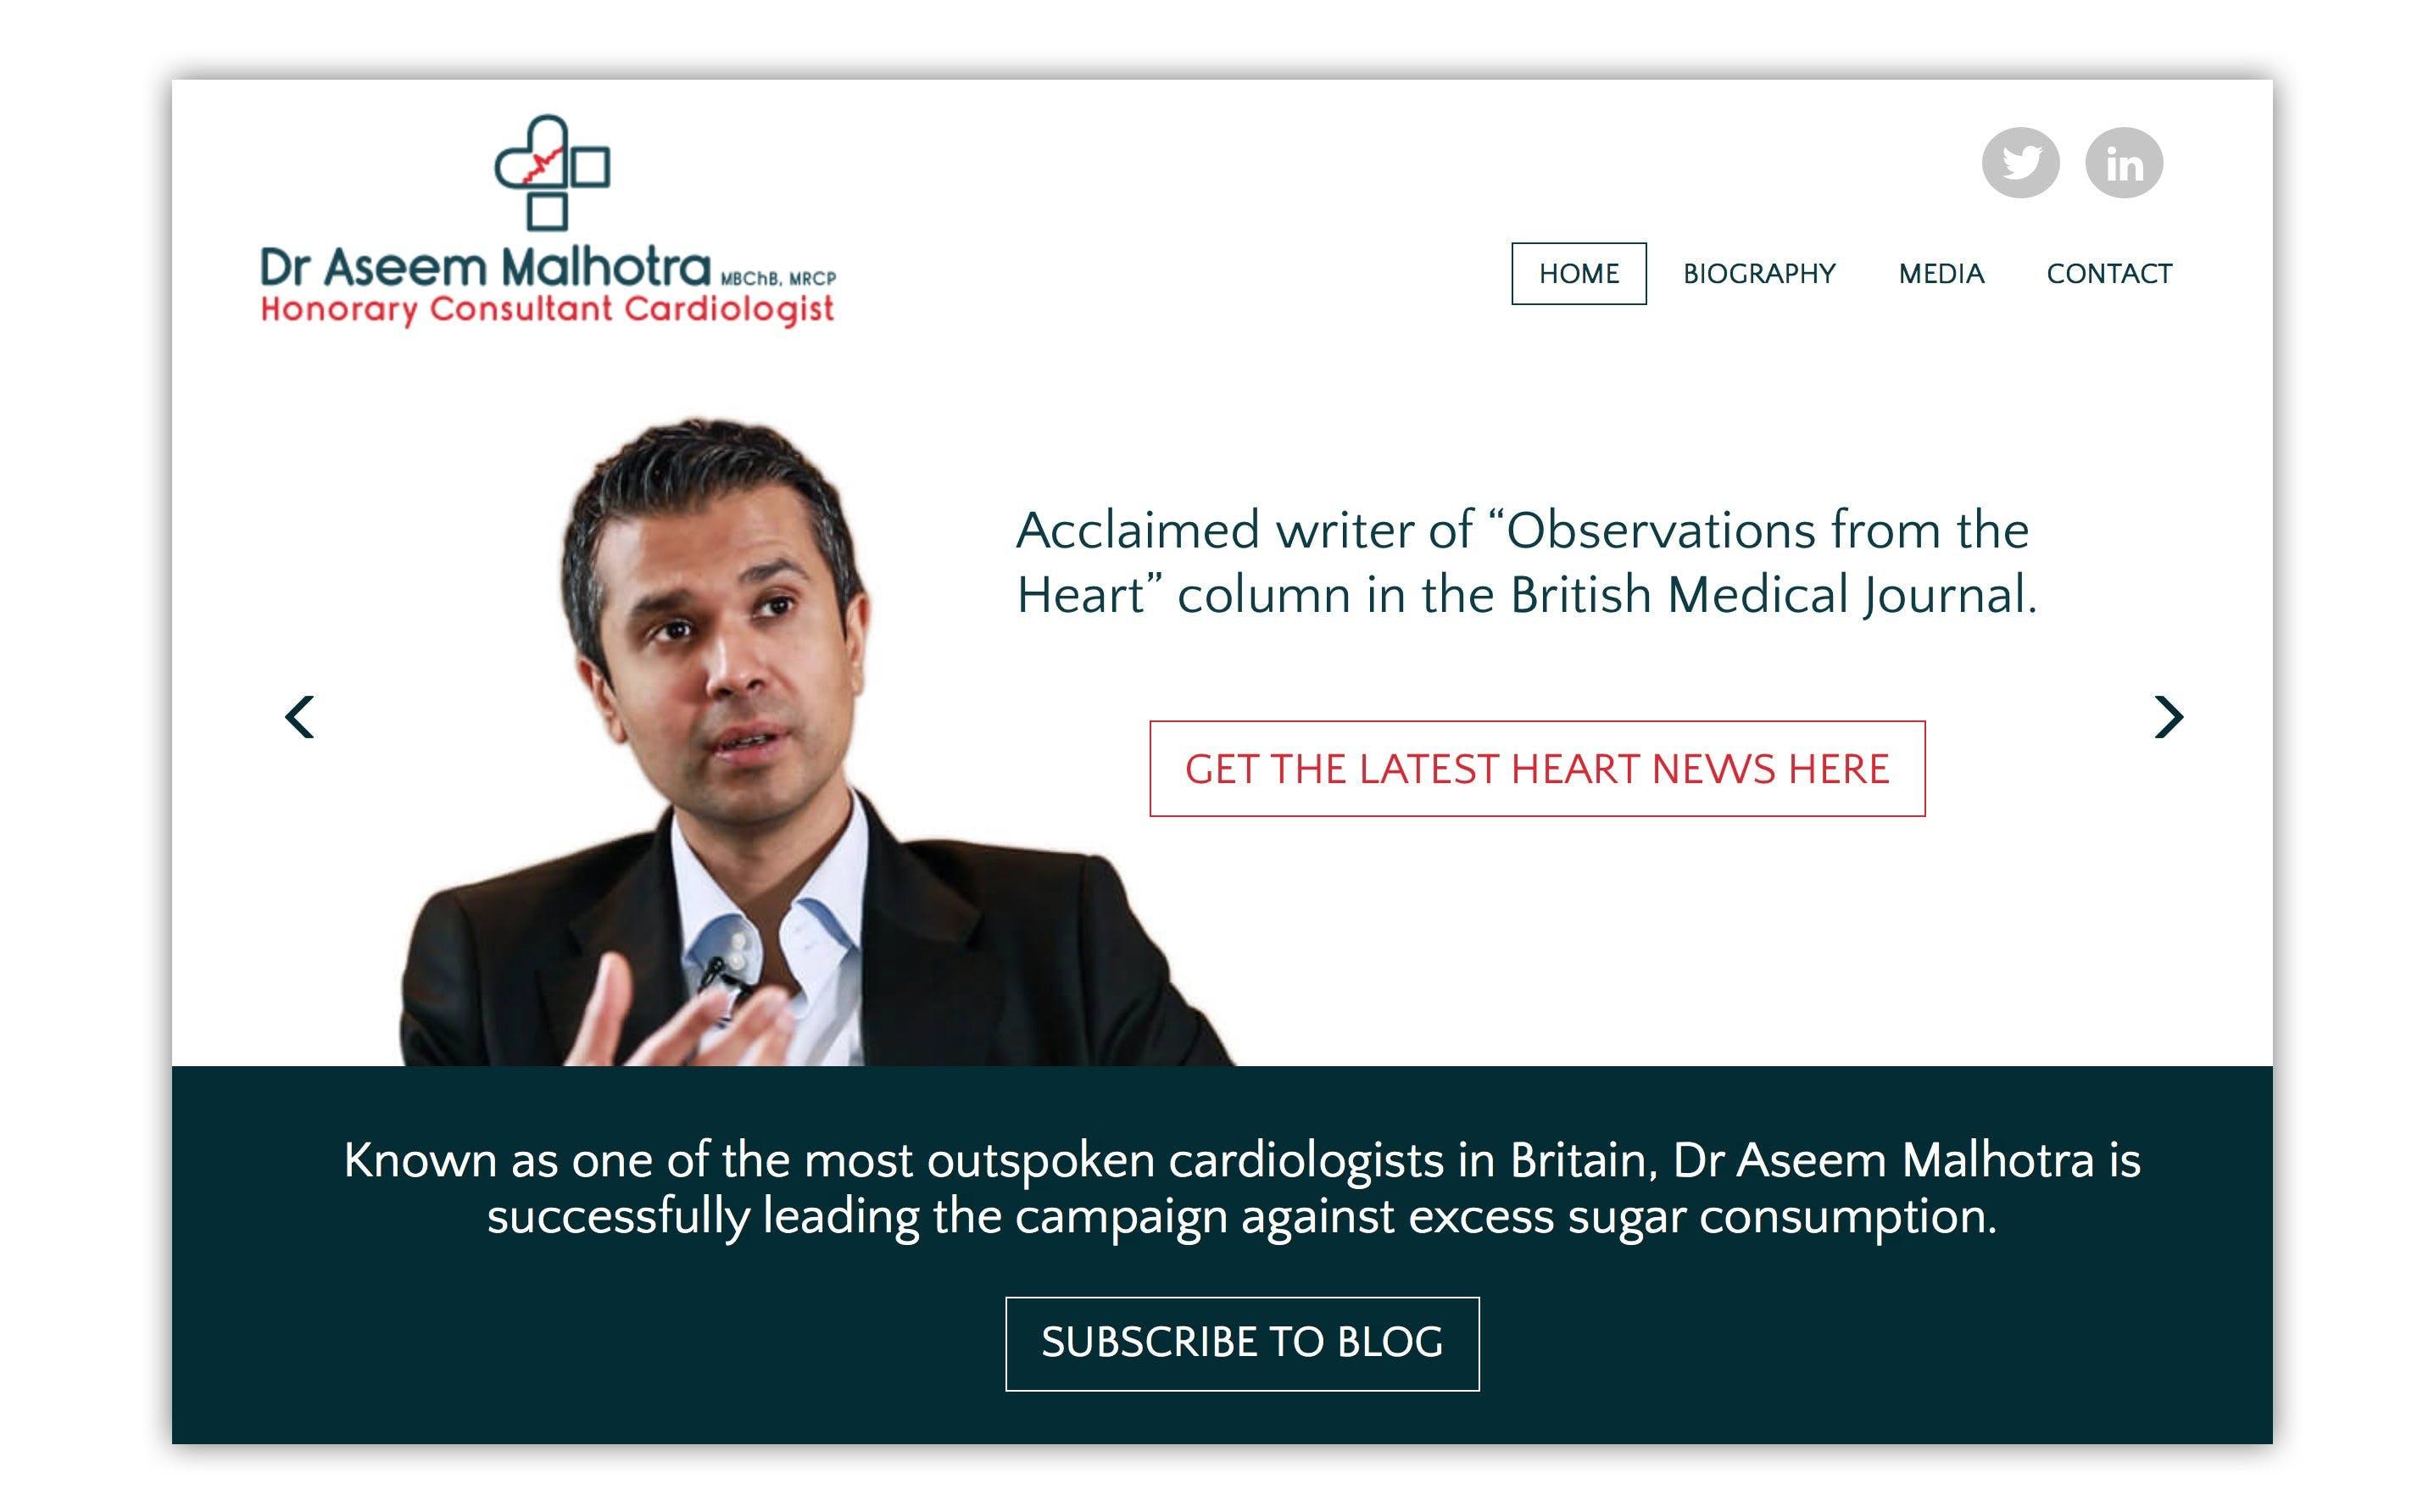 Leading Anti-Sugar Crusader Dr. Aseem Malhotra has a New Website and Blog